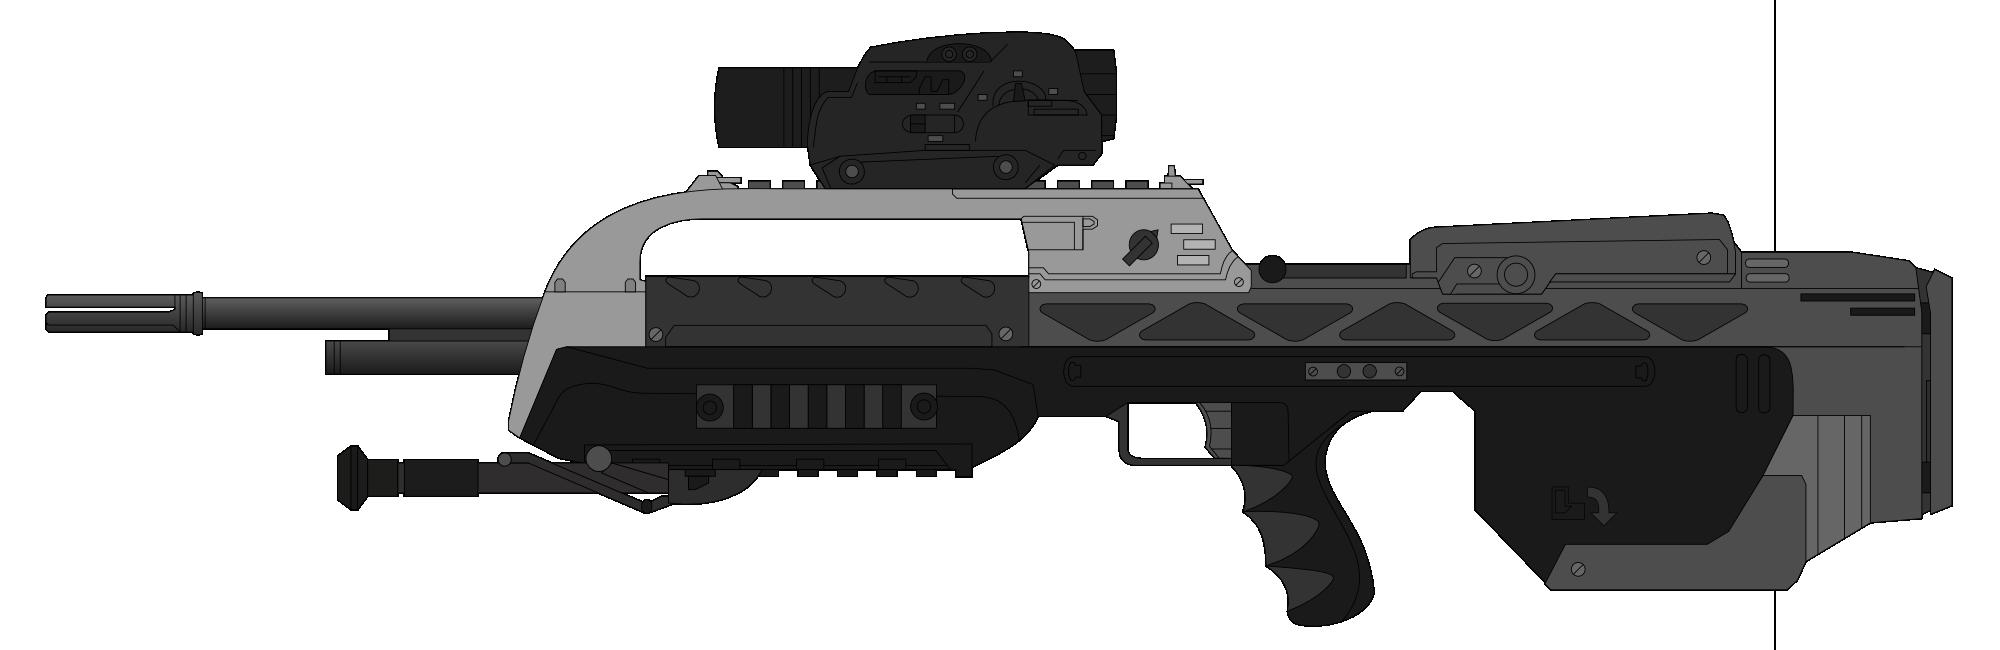 M62 battle rifle